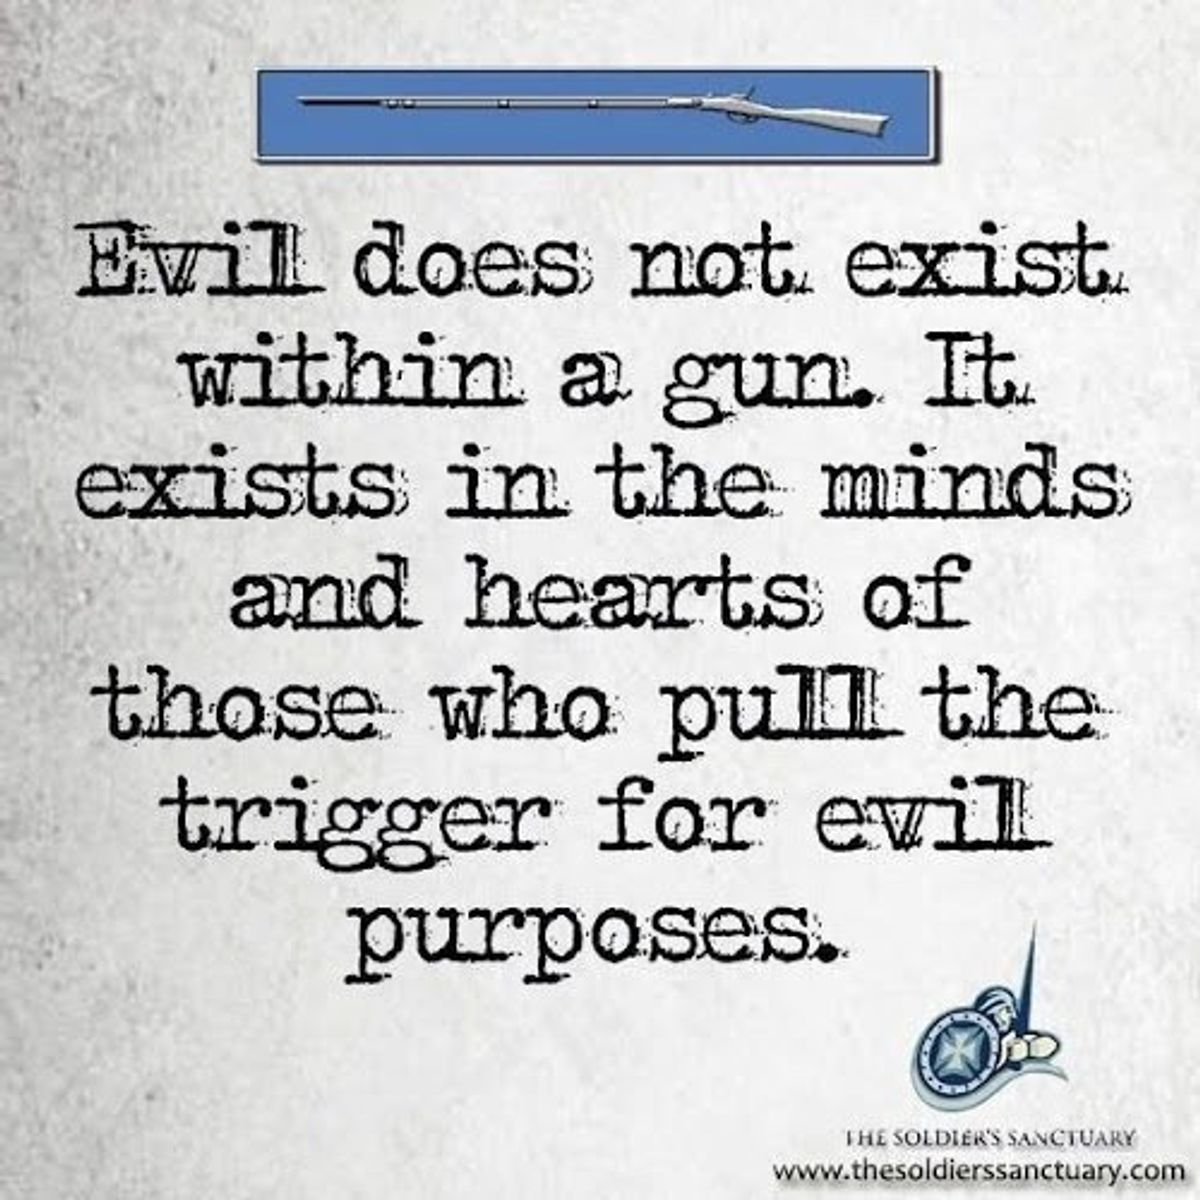 I Shoot Guns Recreationally, But Don't Blame My Family For Gun Abuse